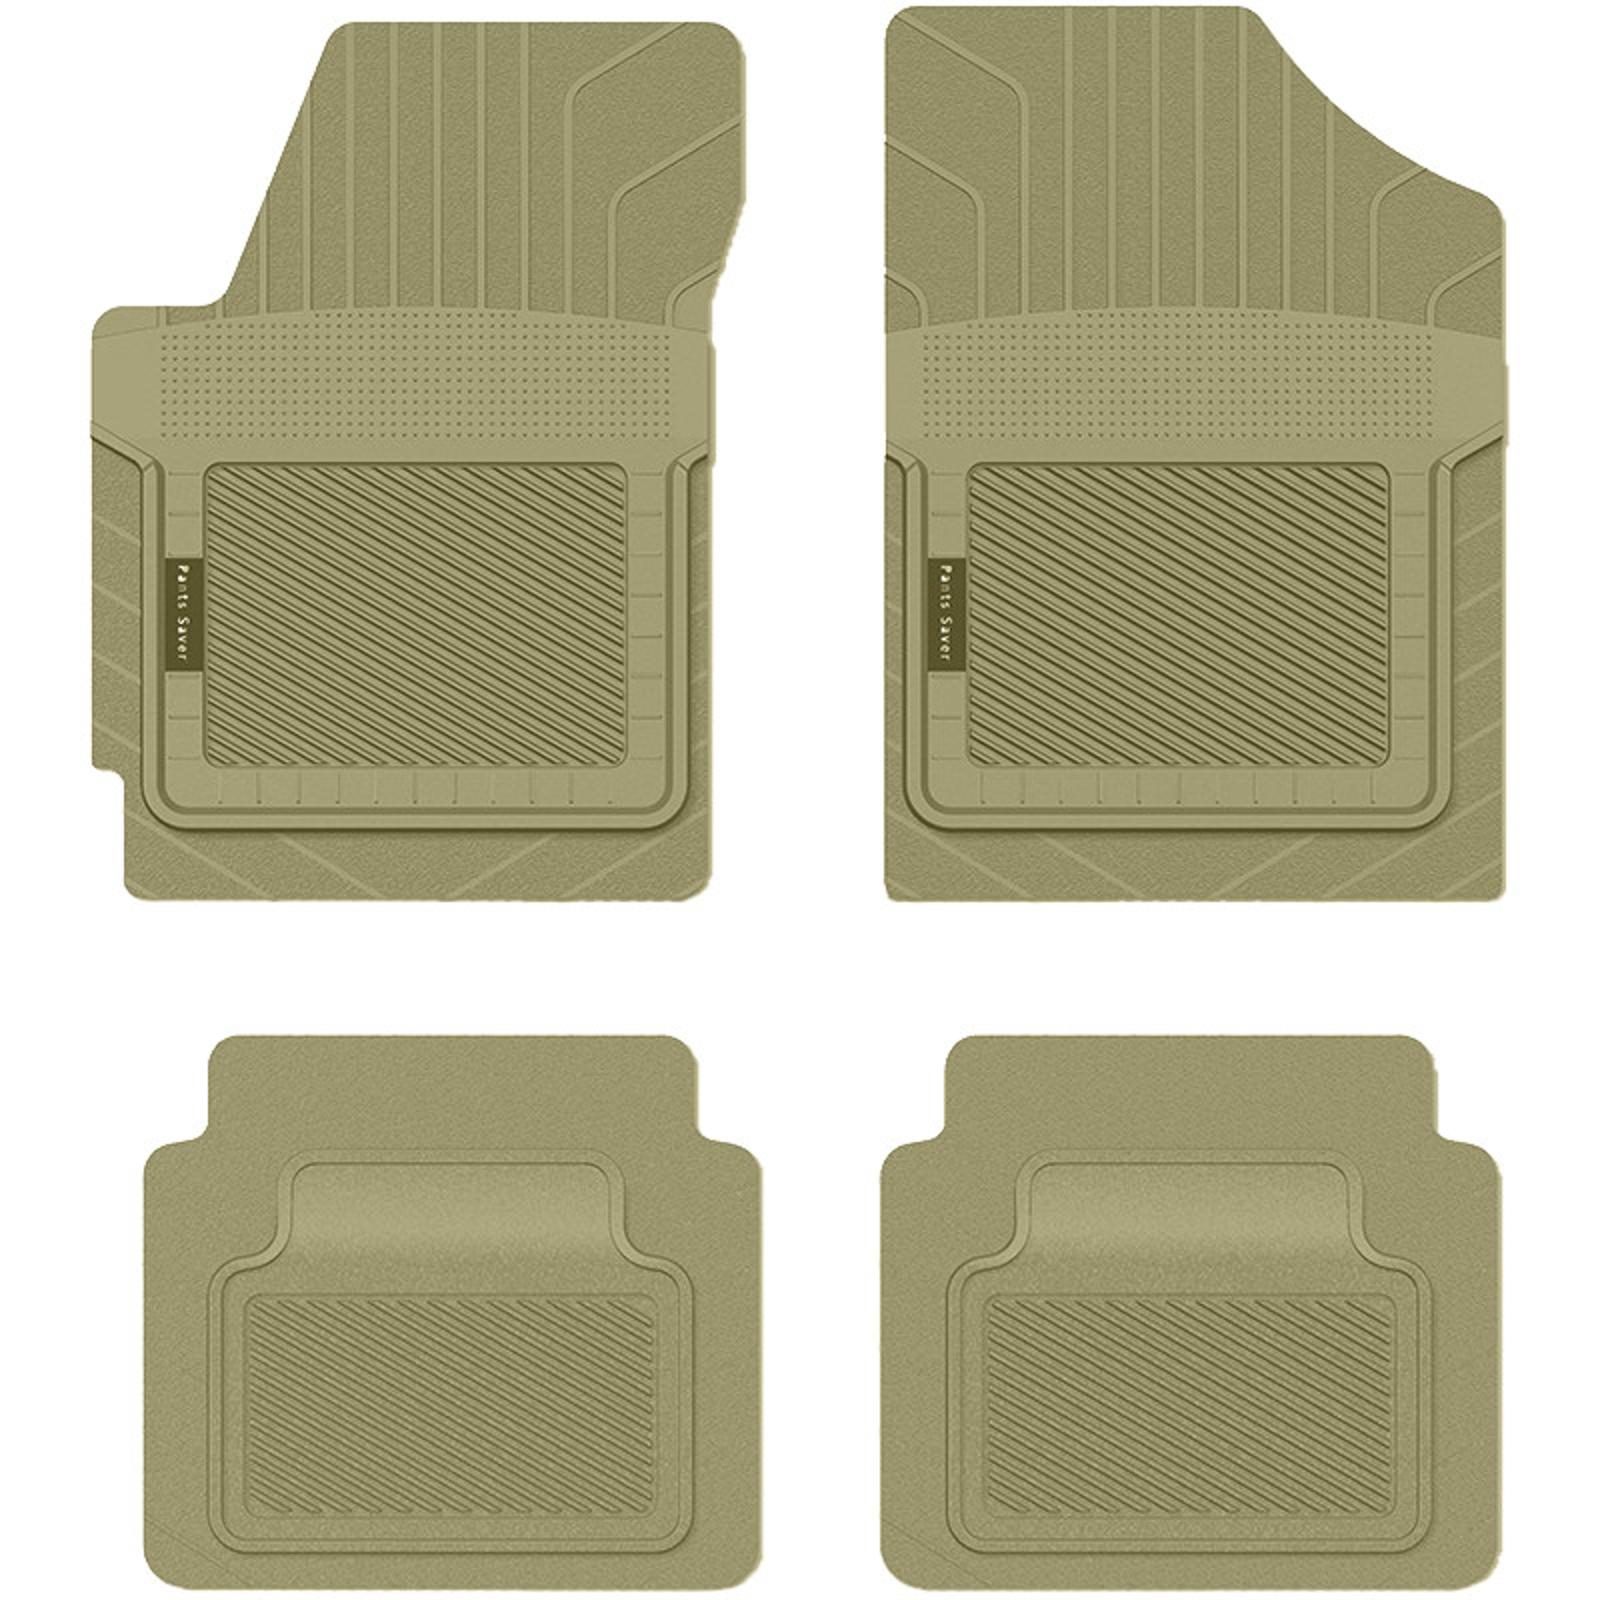 Koolatron Pants Saver Custom Fit Car Mat 4PC CHEVROLET EXPRESS G2500 2012 Tan PartNumber: 02845080000P KsnValue: 02845080000 MfgPartNumber: 0716123